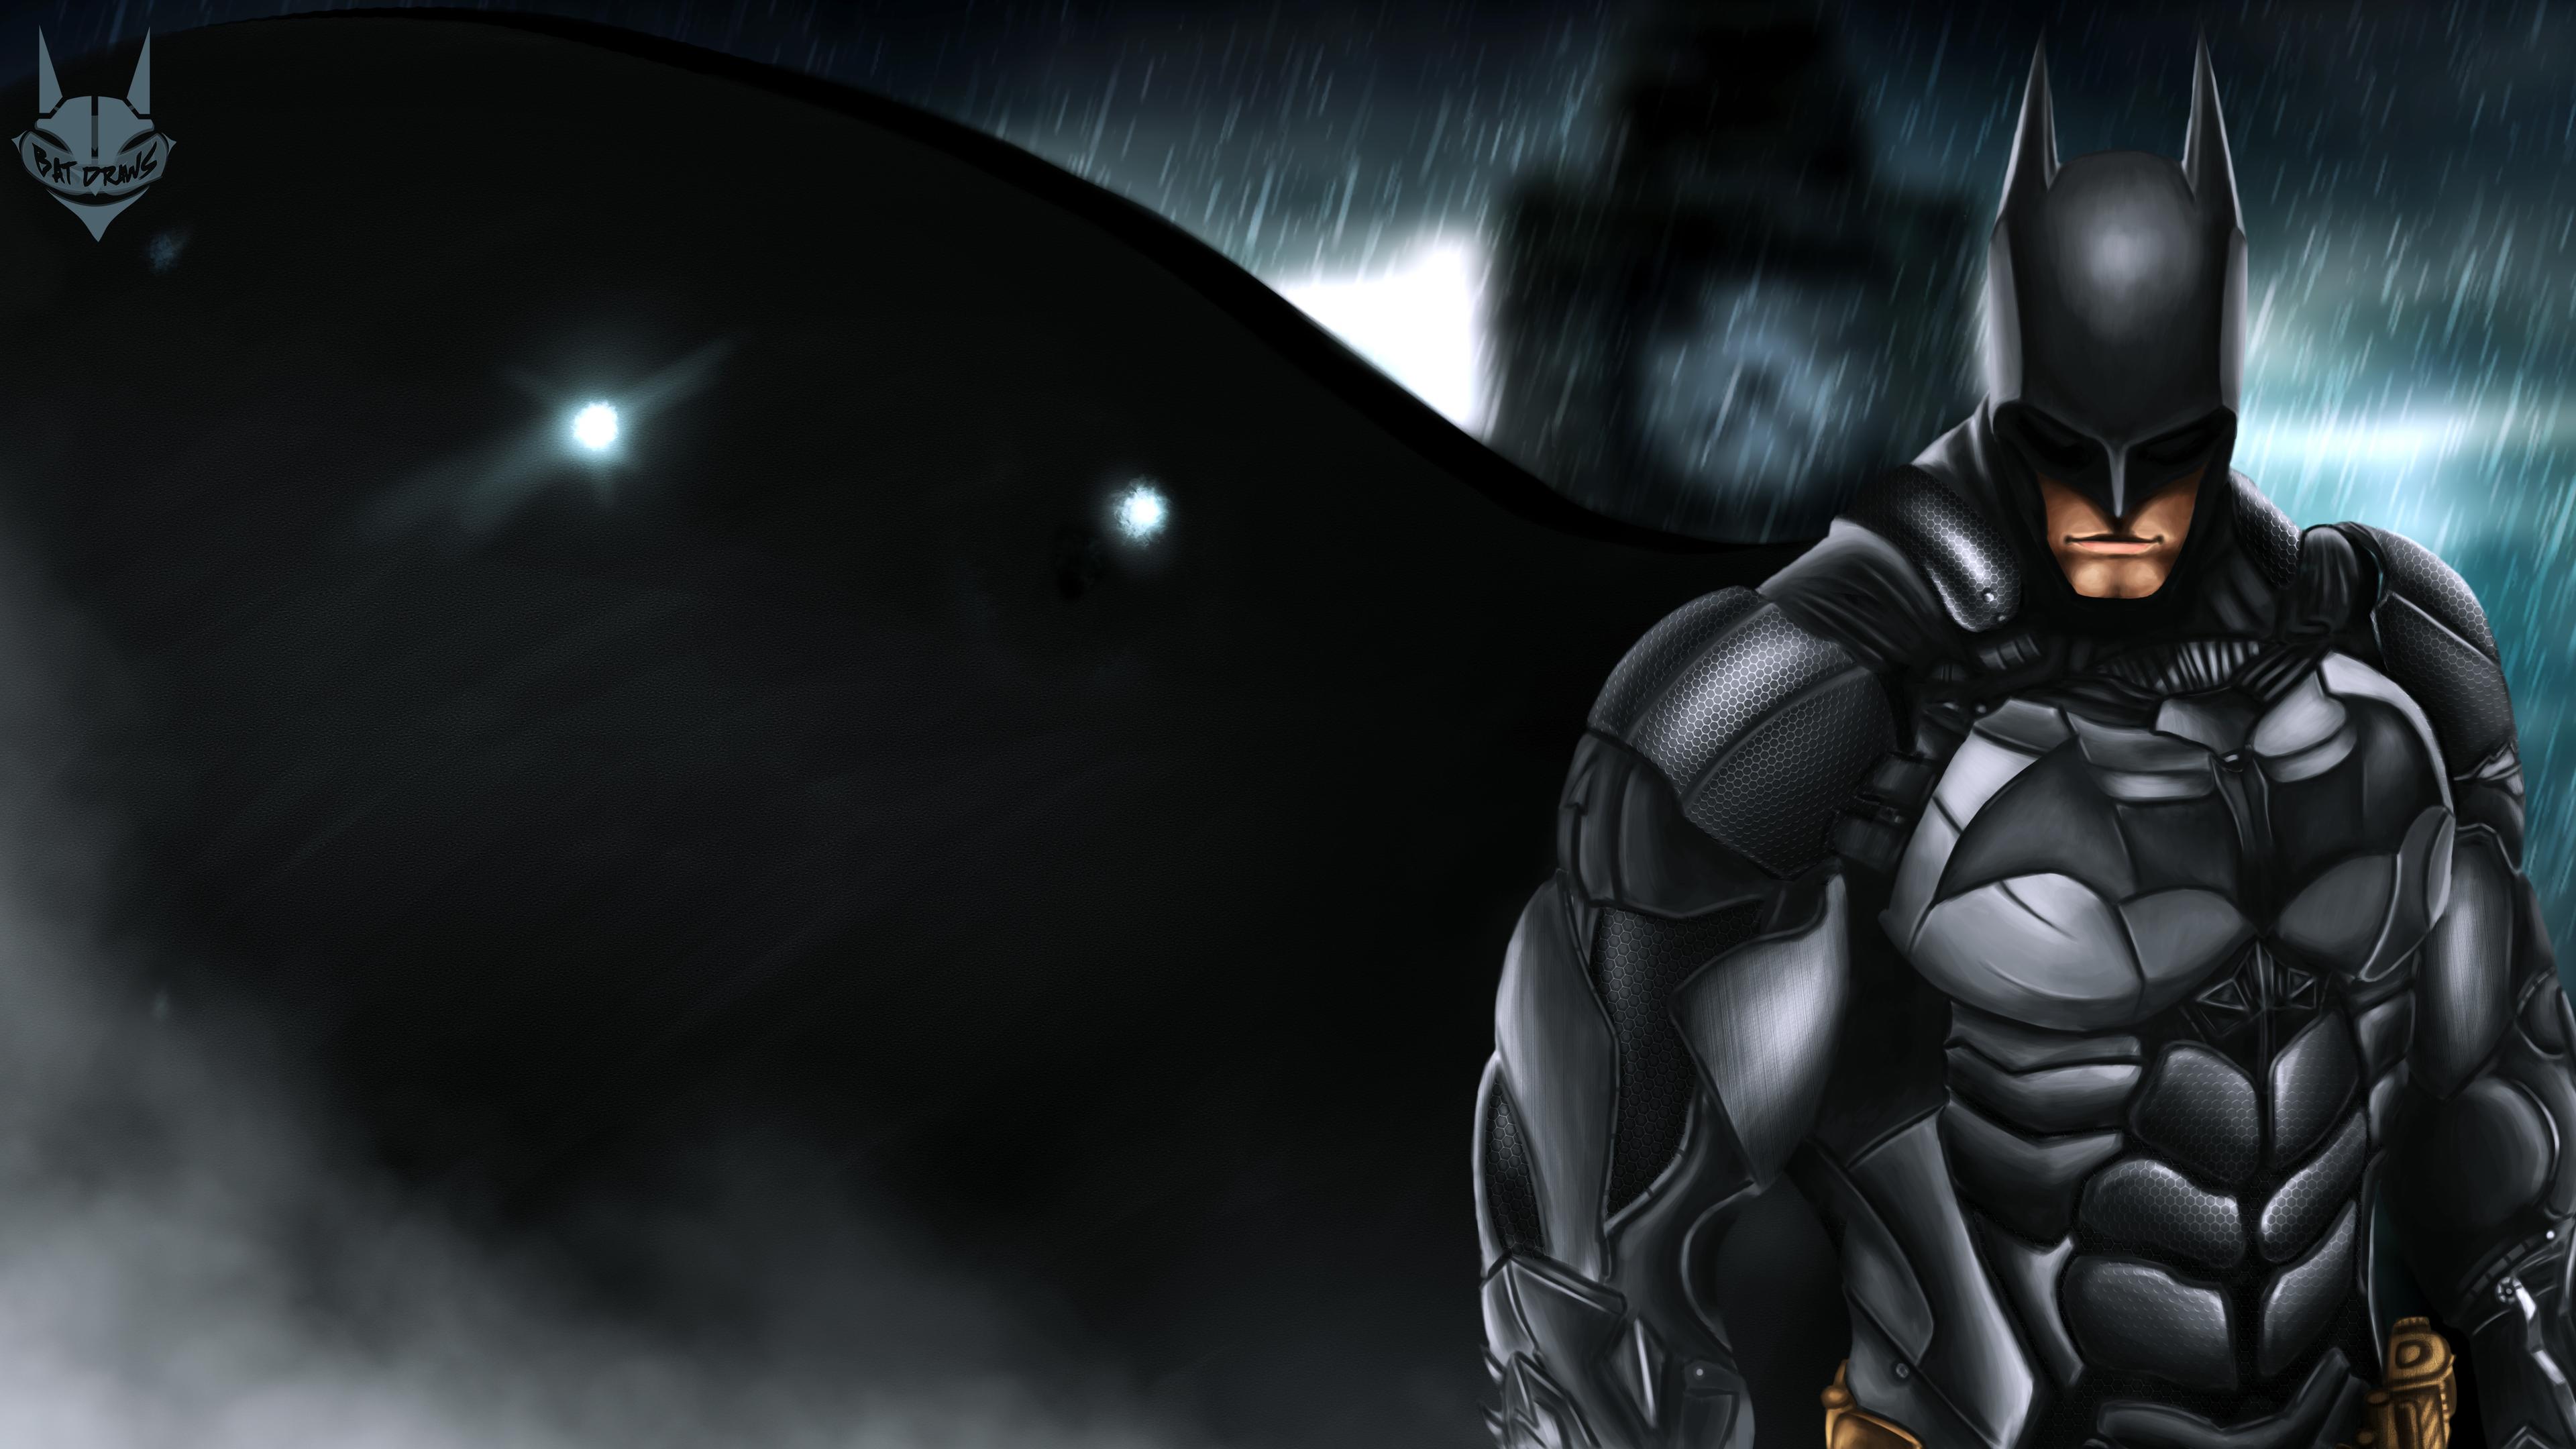 batman artwork 5k 2018 1538786497 - Batman Artwork 5k 2018 - superheroes wallpapers, hd-wallpapers, digital art wallpapers, deviantart wallpapers, batman wallpapers, artwork wallpapers, artist wallpapers, 5k wallpapers, 4k-wallpapers